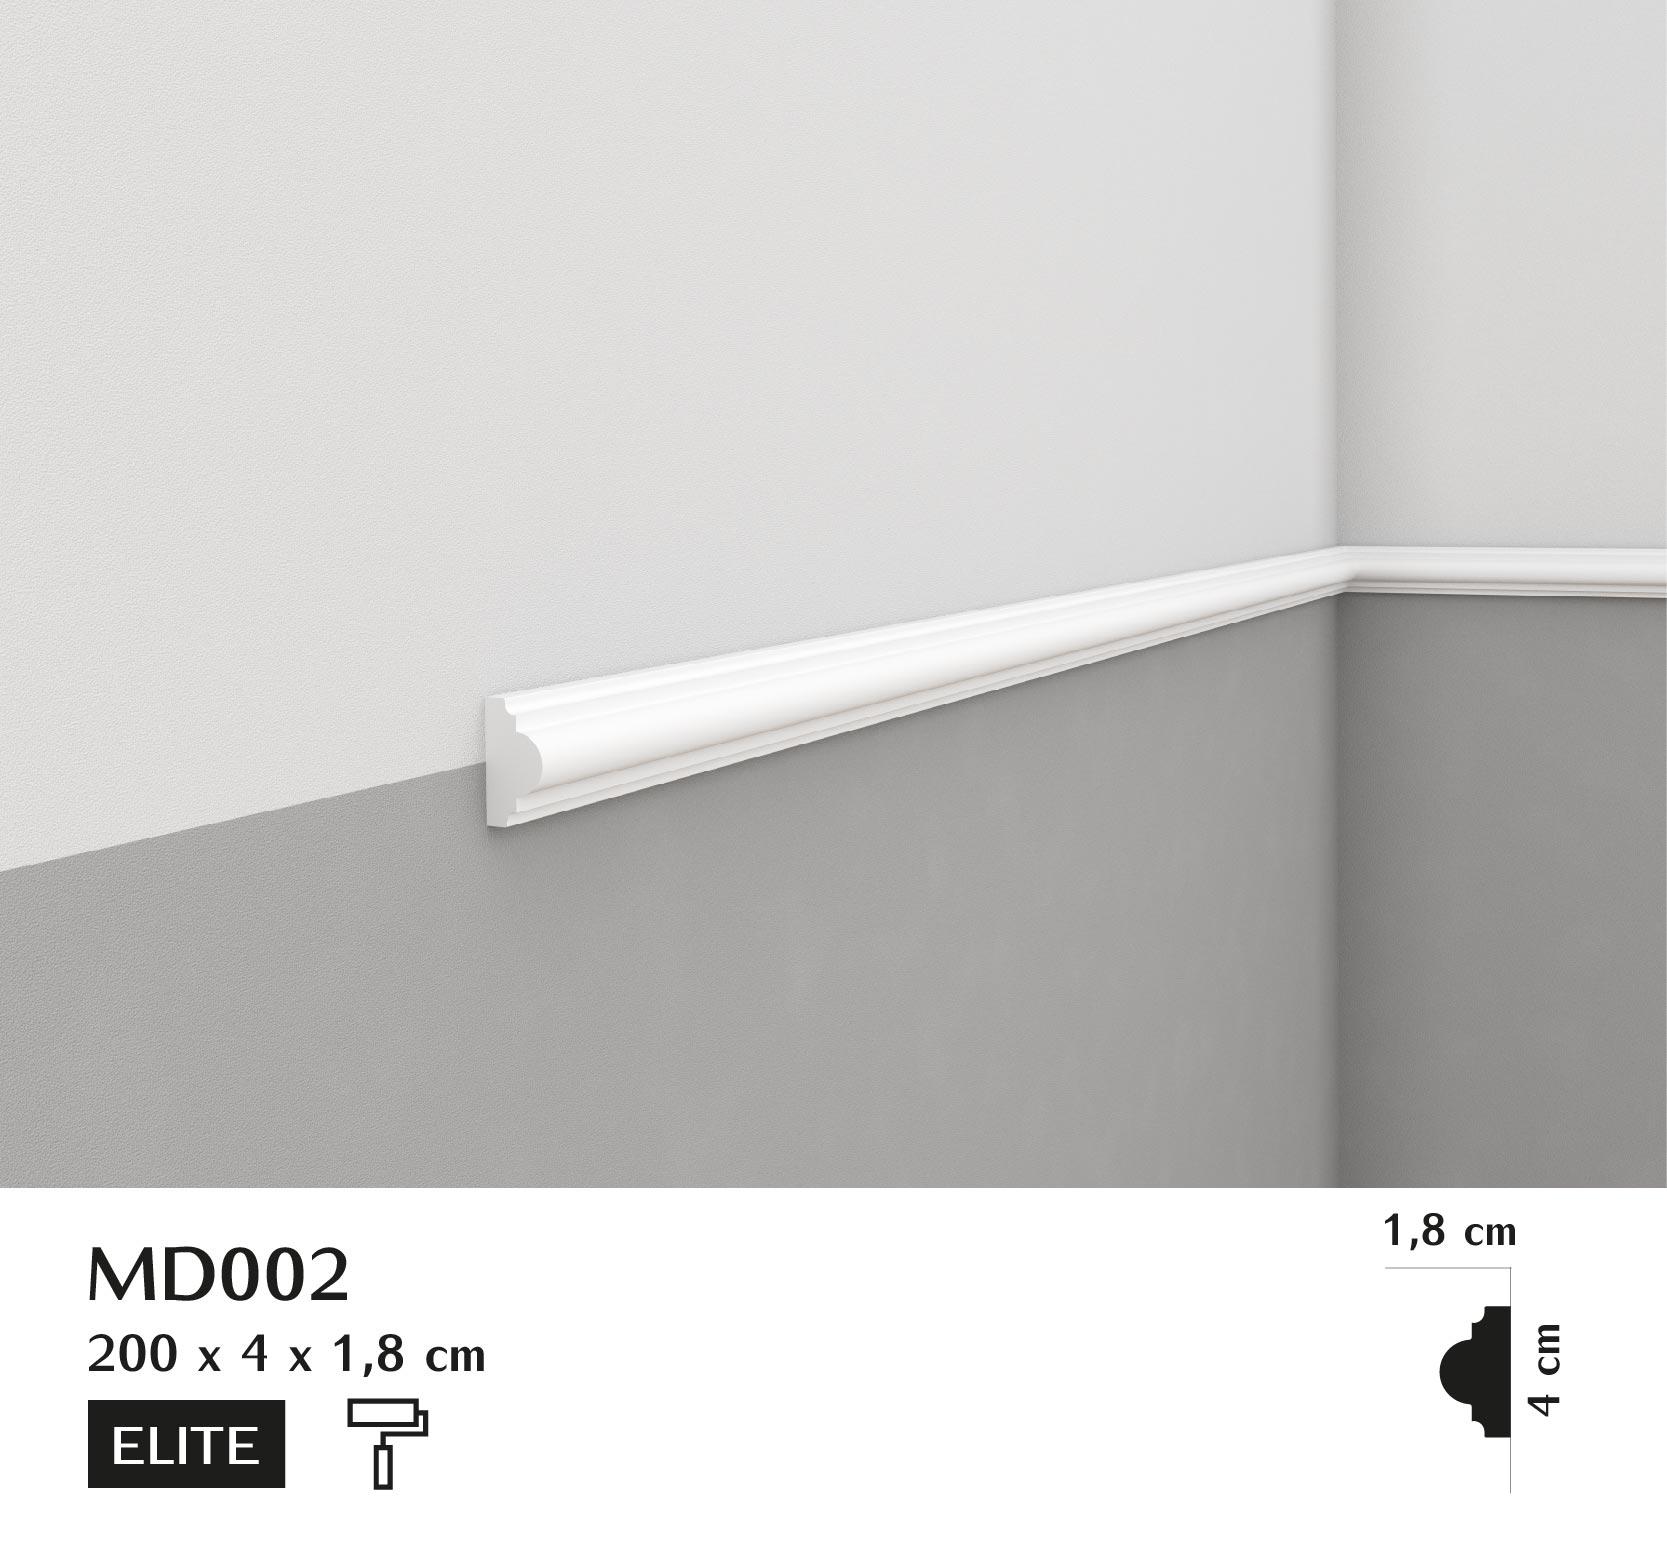 Md002